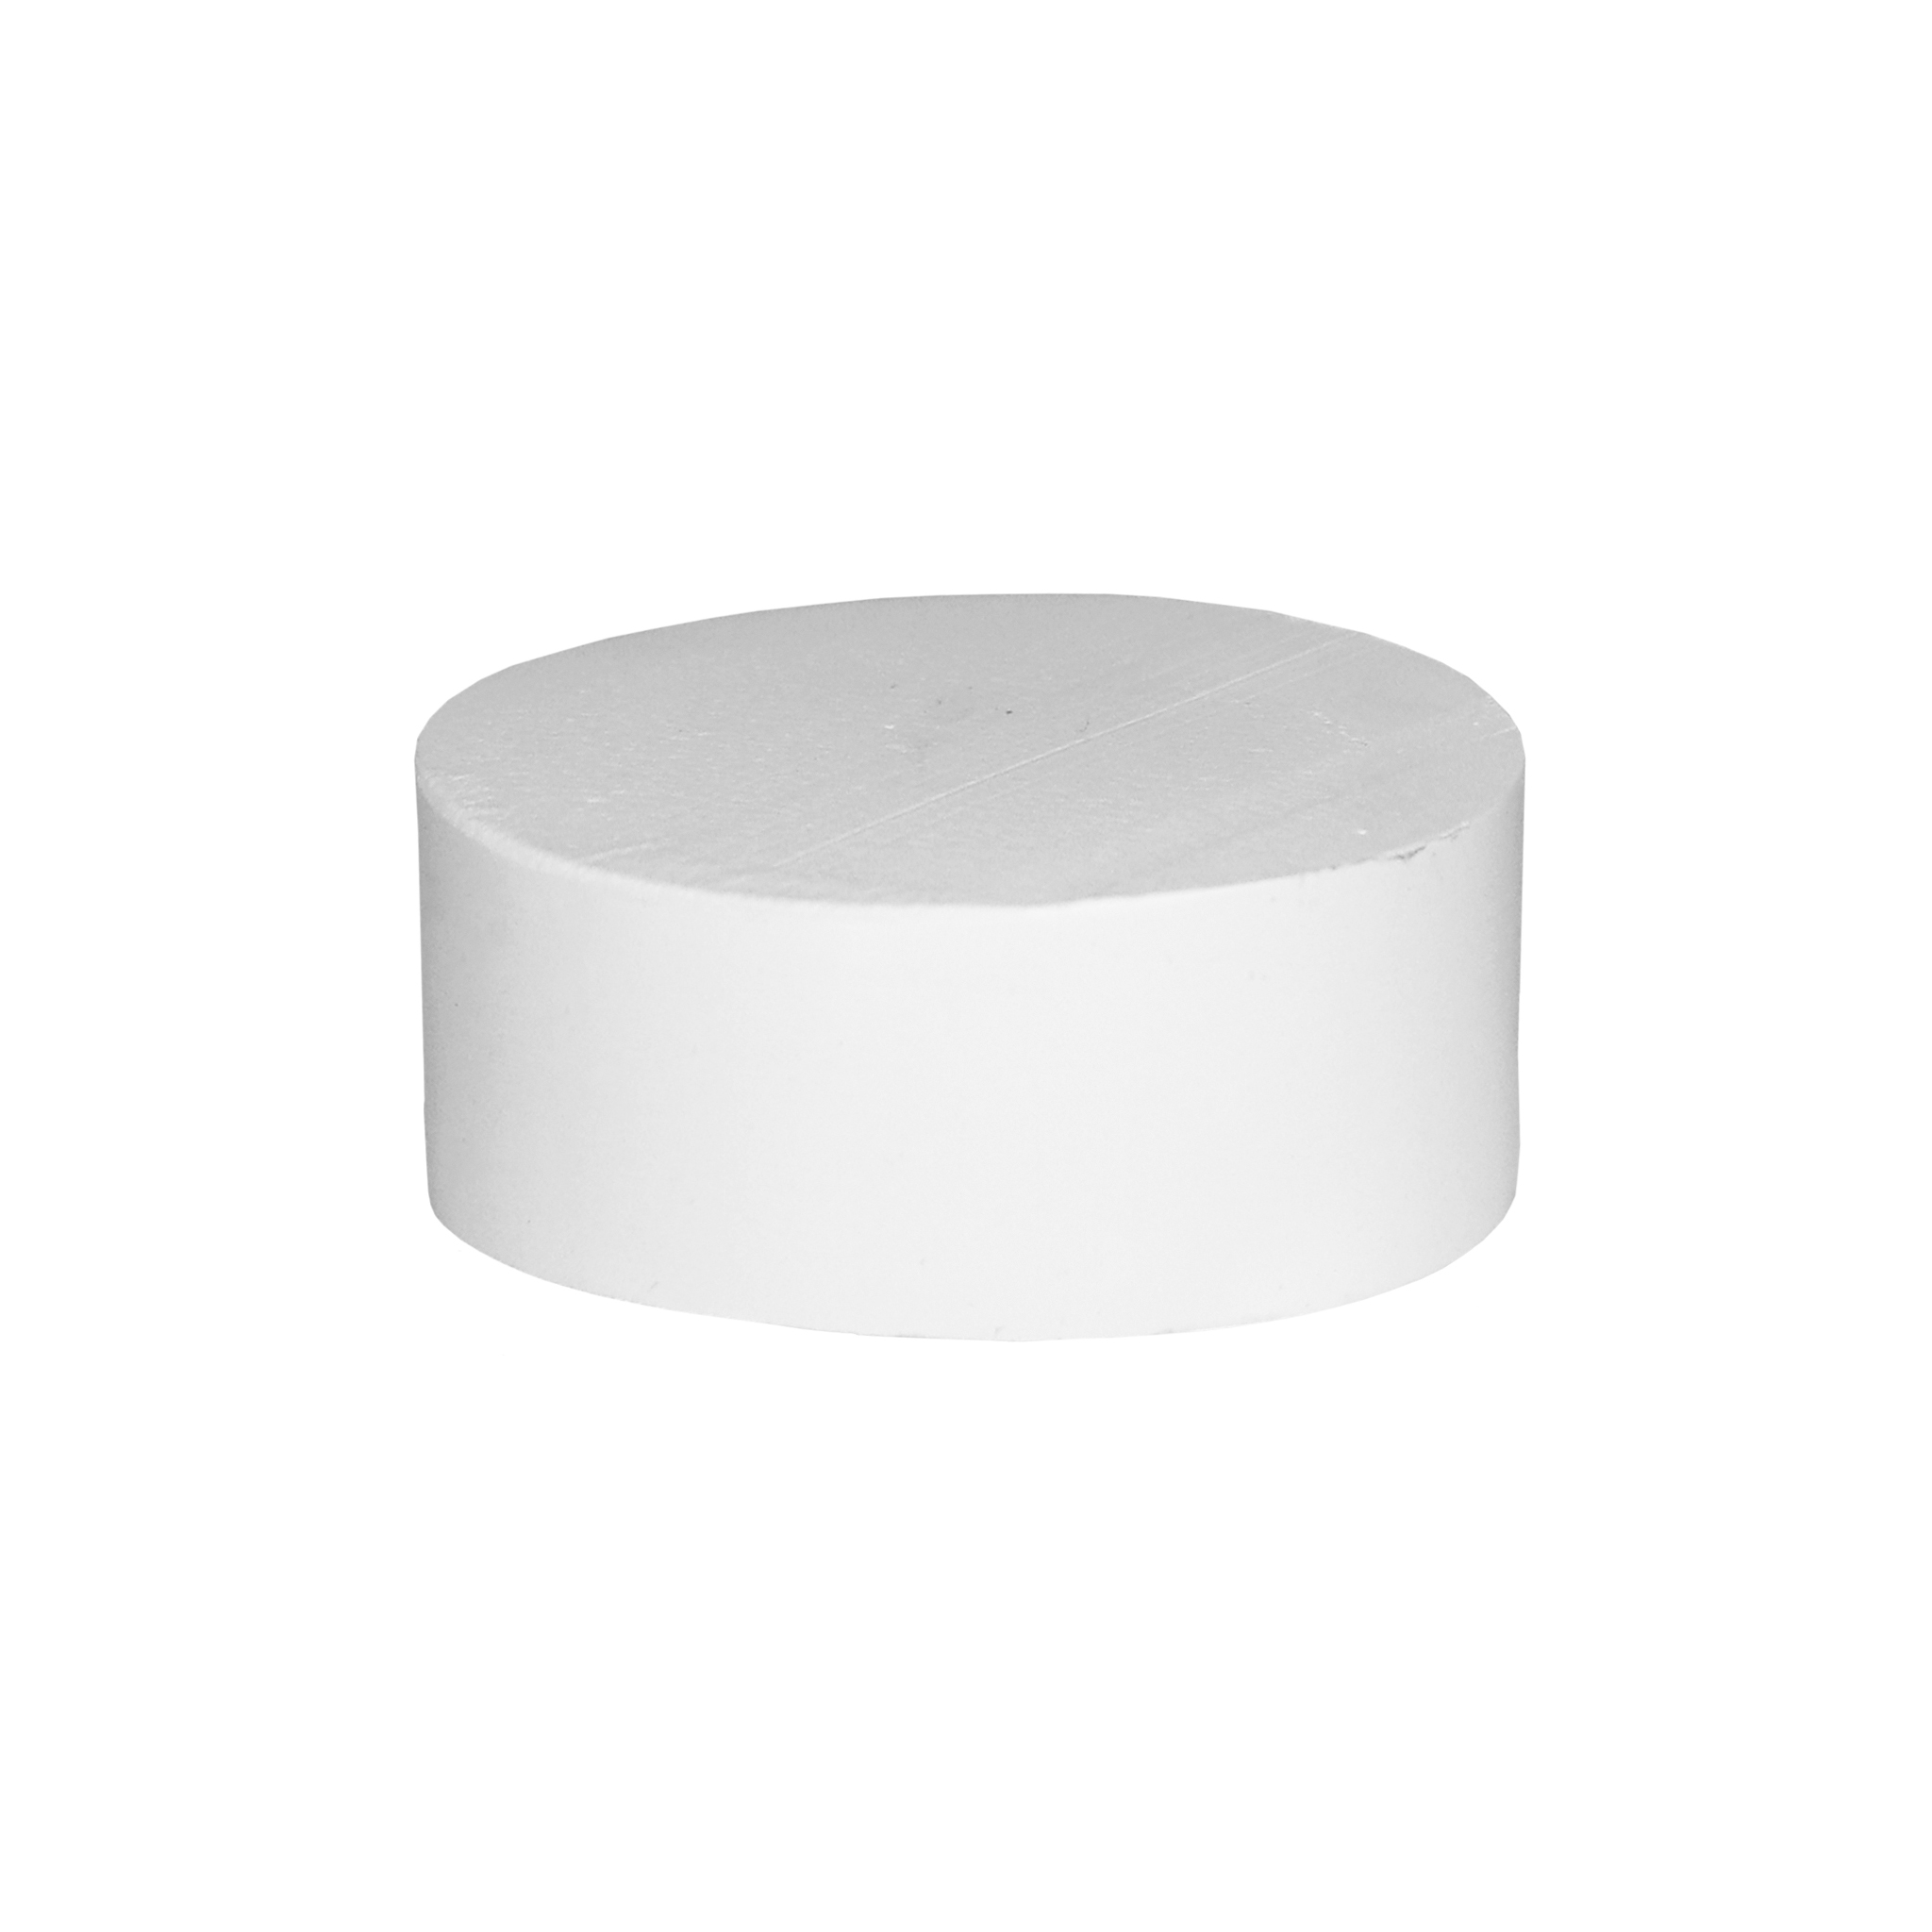 HRANITHERM 1000.71 Blanc - EVA Thermofusible